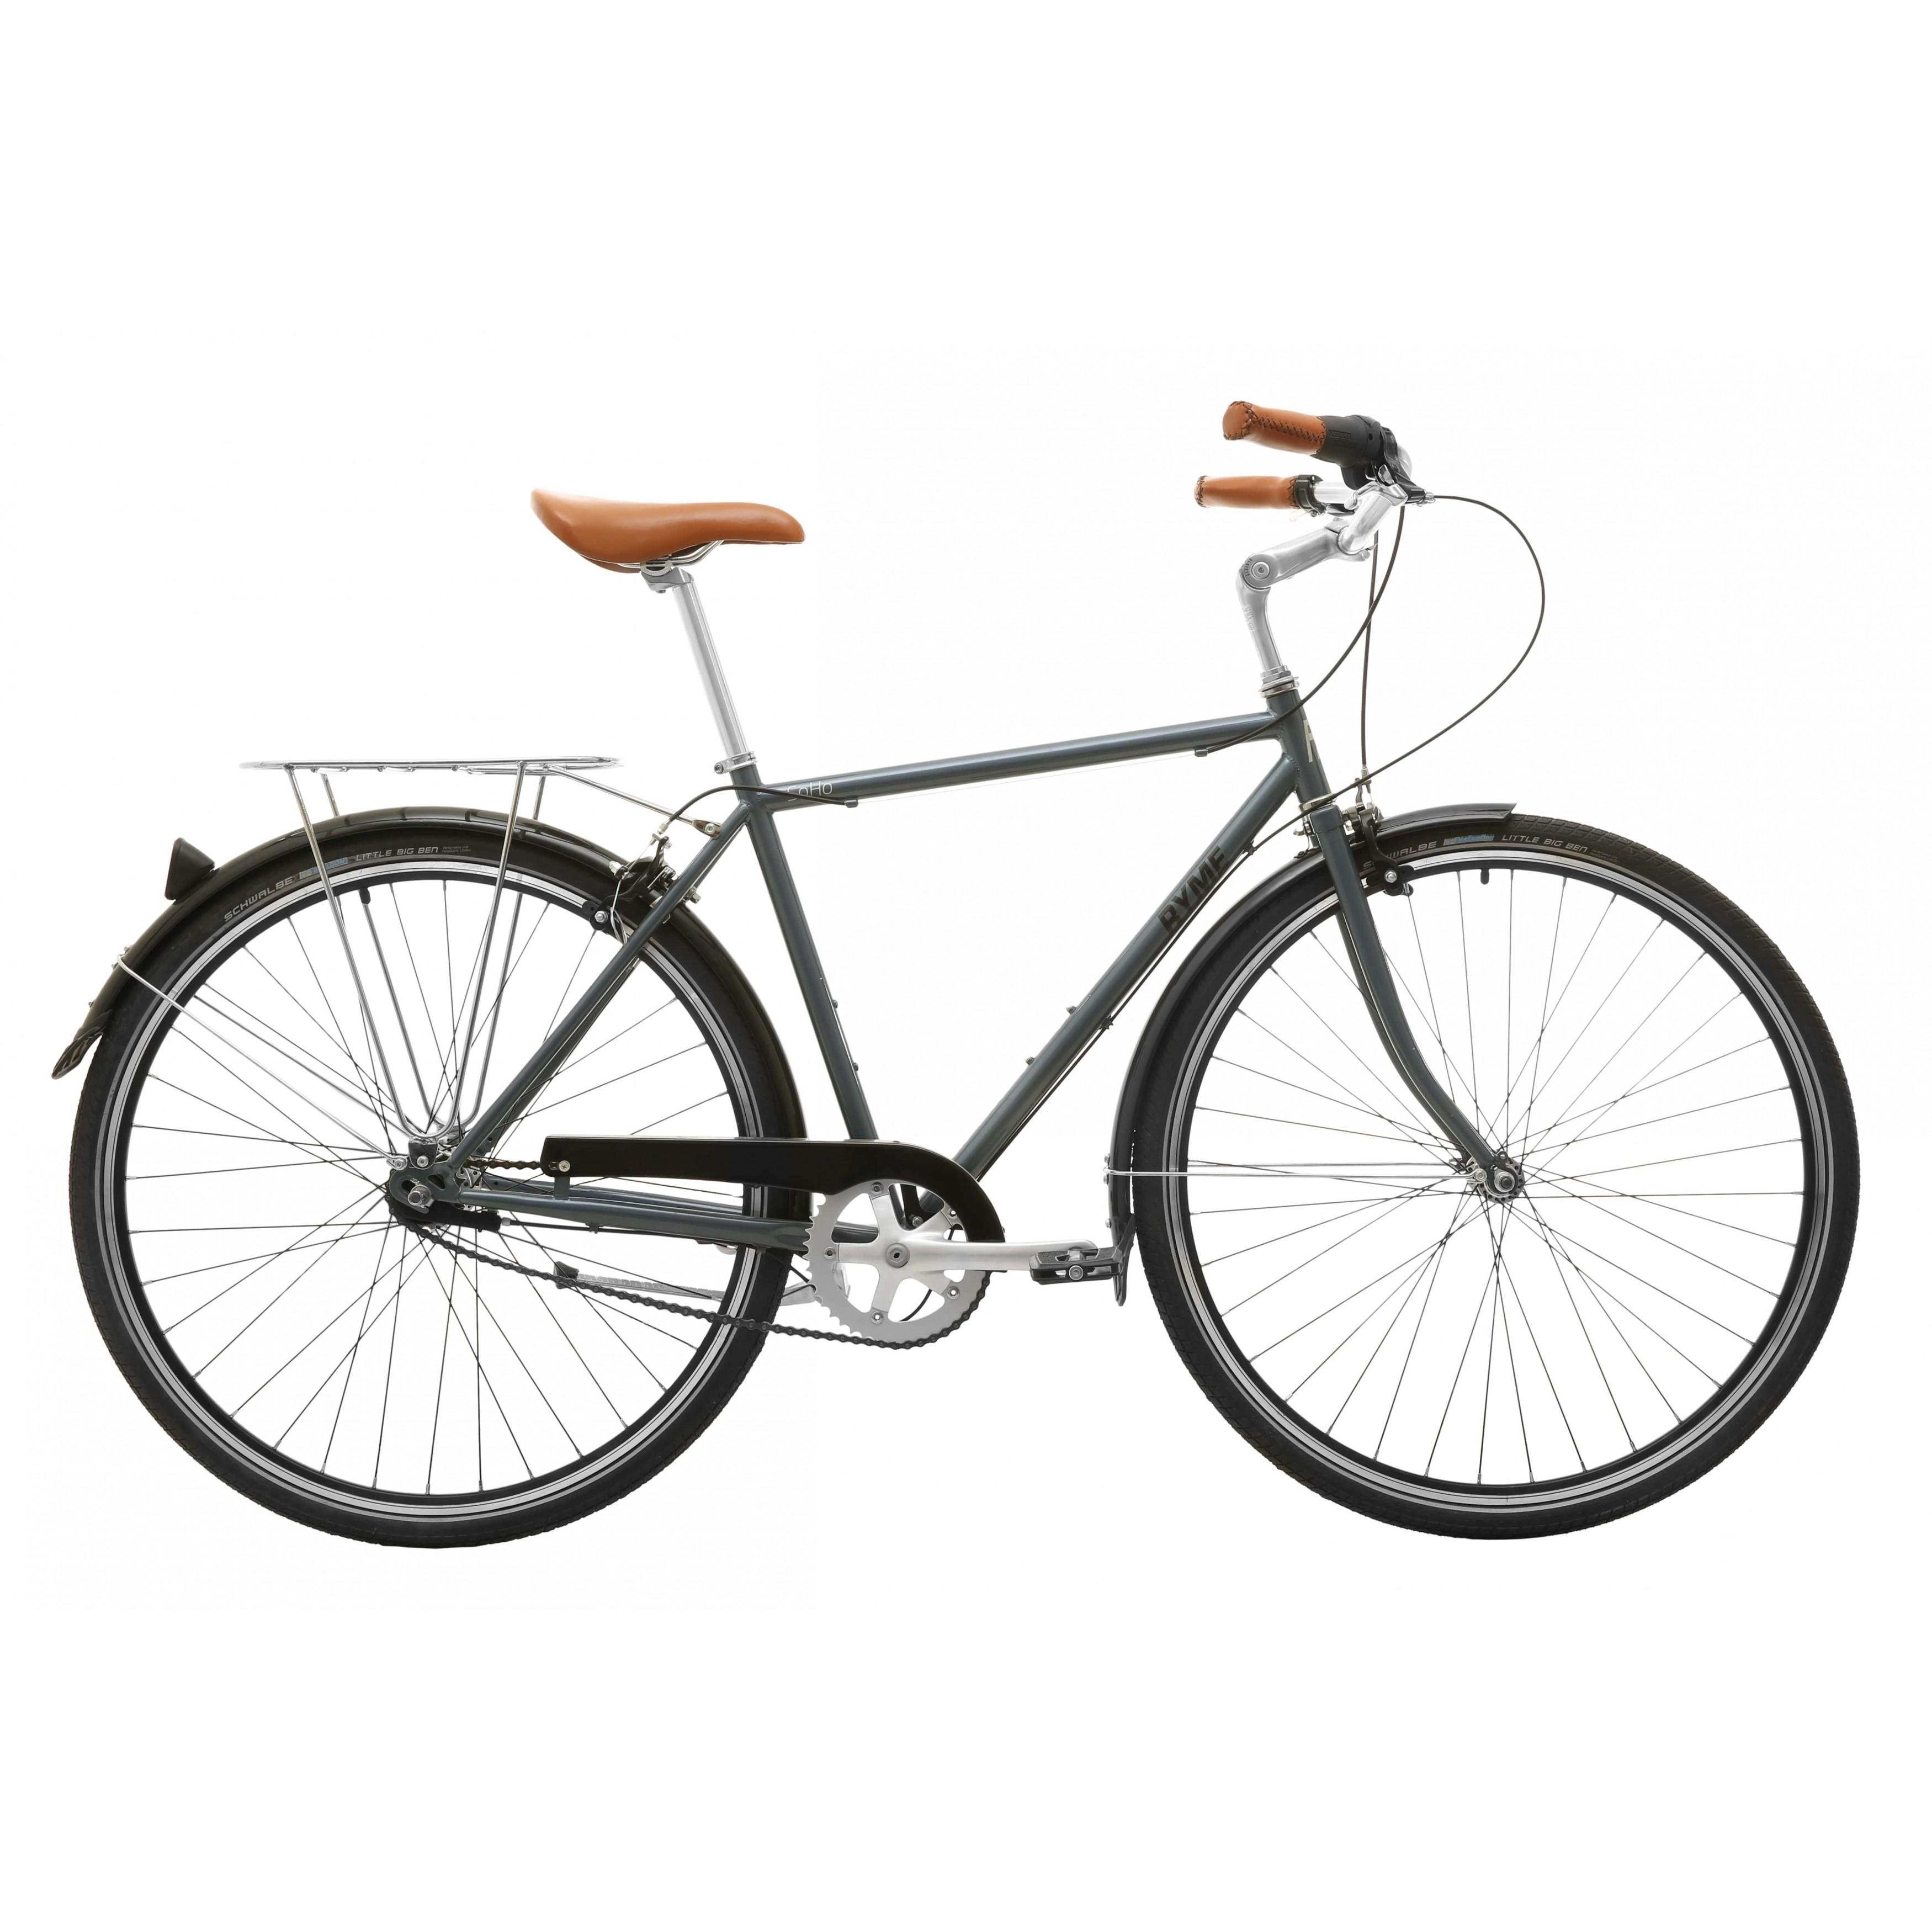 Bicicleta urbana de ocio SoHo